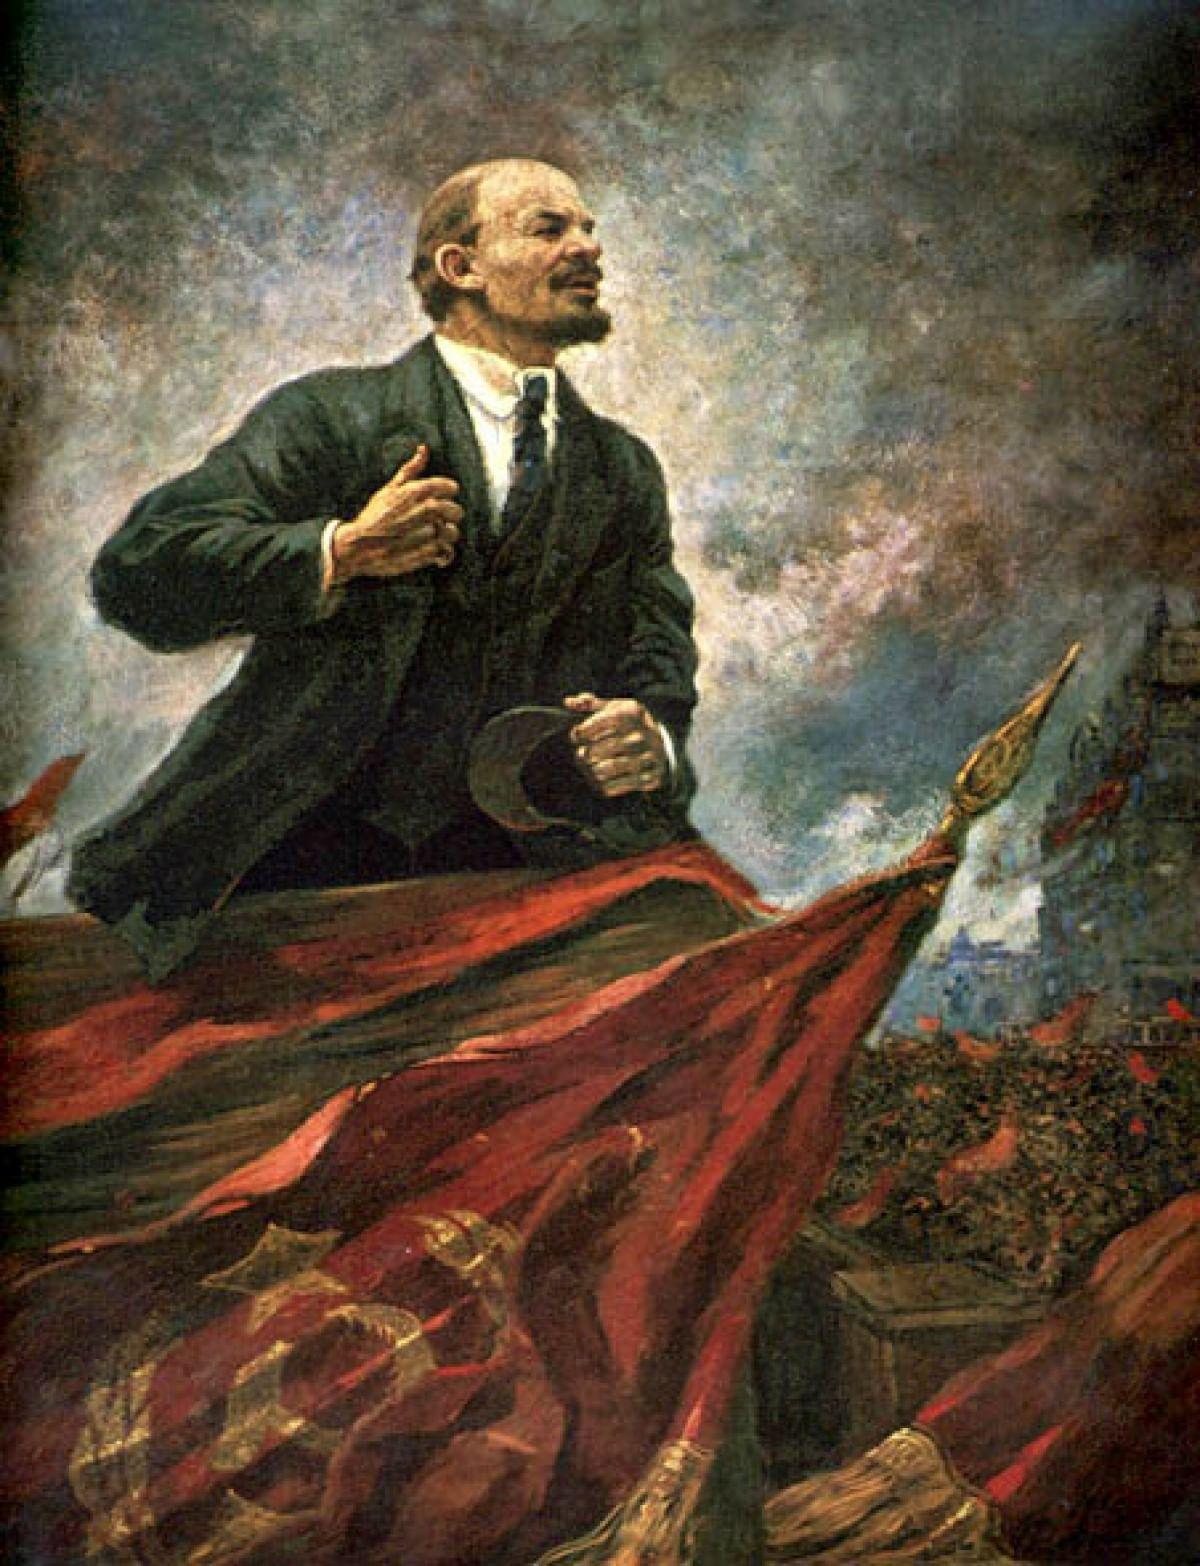 романтики страны Советов 1